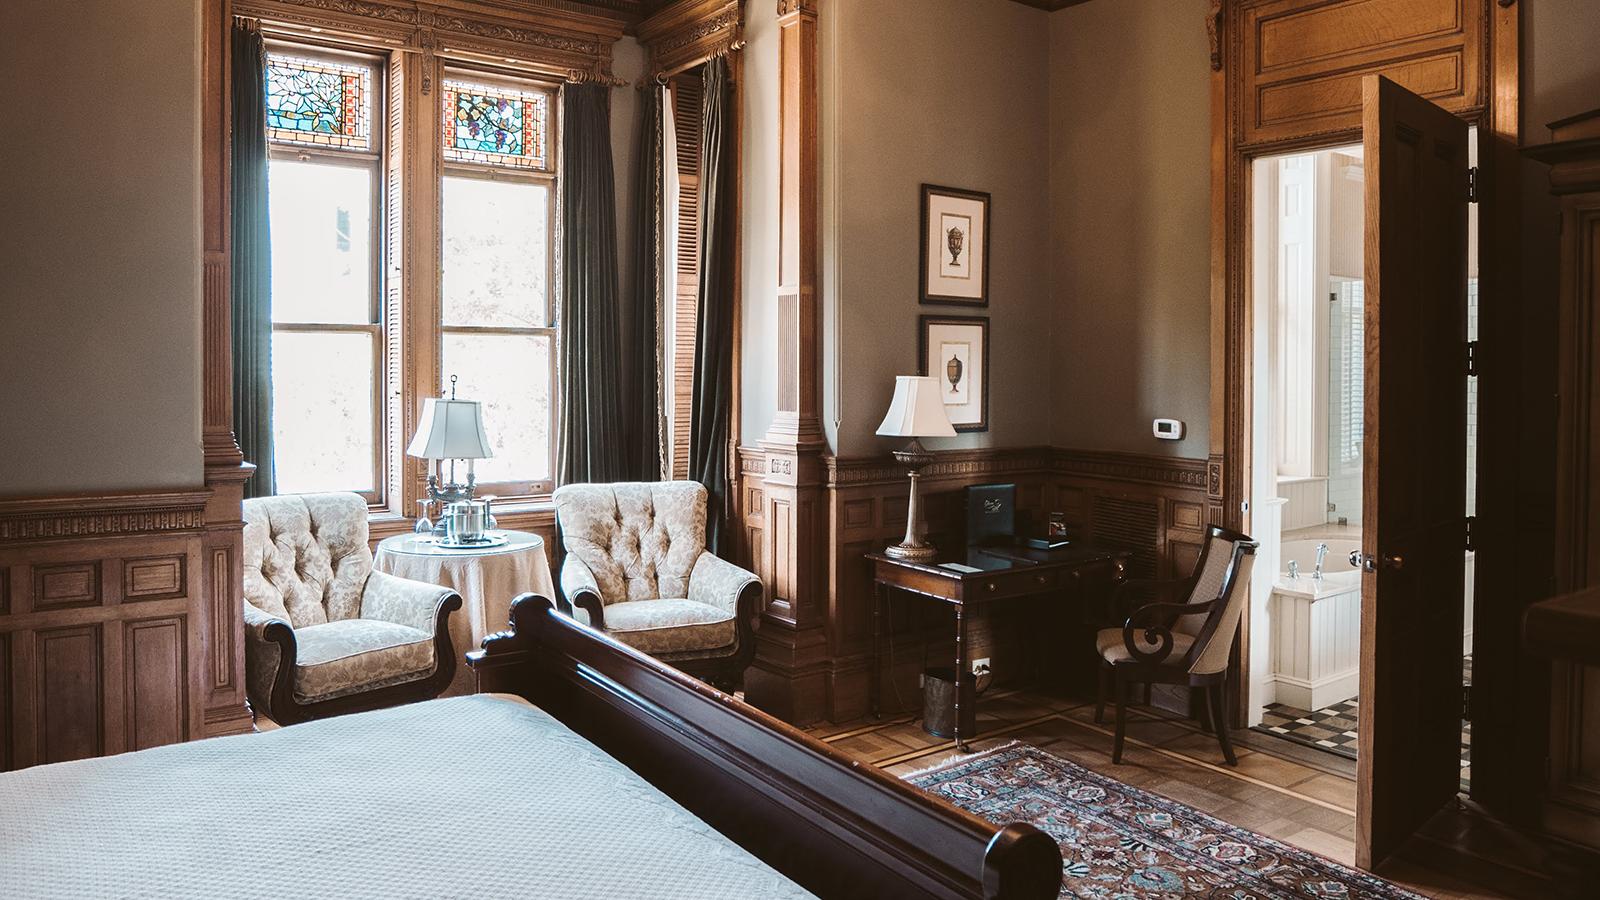 Image of Lobby, Wentworth Mansion, Charleston, South Carolina, 1886, Member of Historic Hotels of America,, Accommodations